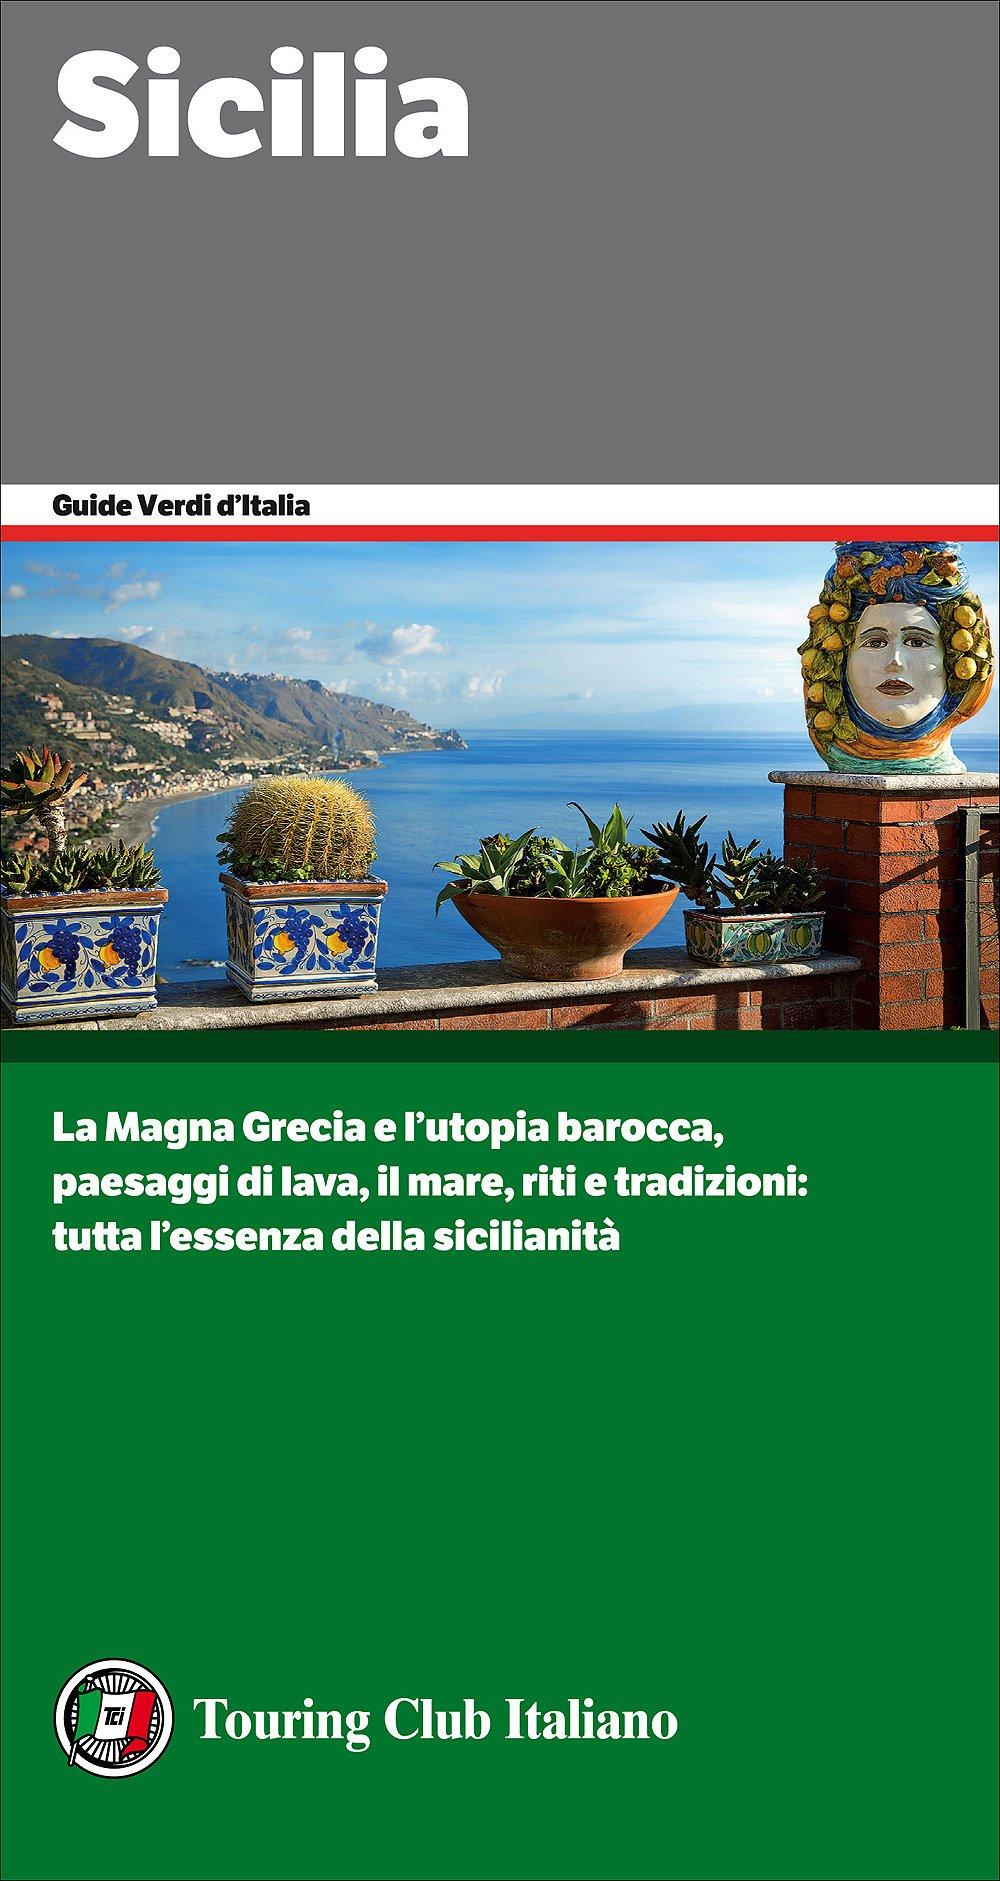 Sicilia: 1 Copertina flessibile – 8 mar 2017 $ion_1_0 [] Touring 8836570429 GEOGRAFIA GENERALE. VIAGGI